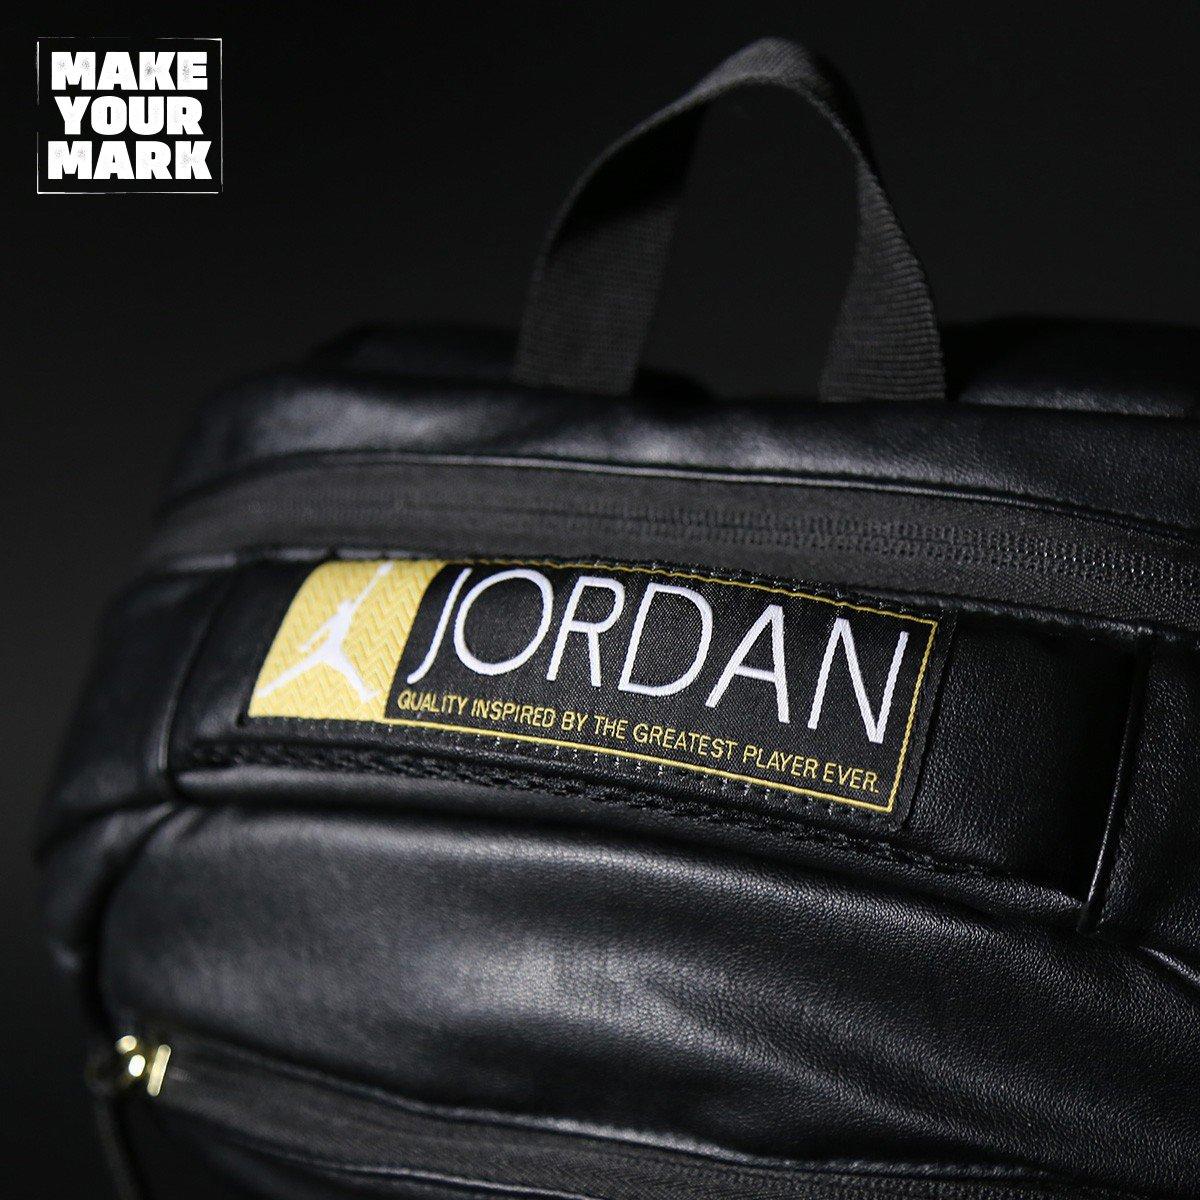 new jordan backpack cheap   OFF58% The Largest Catalog Discounts 9206b3cc0b622